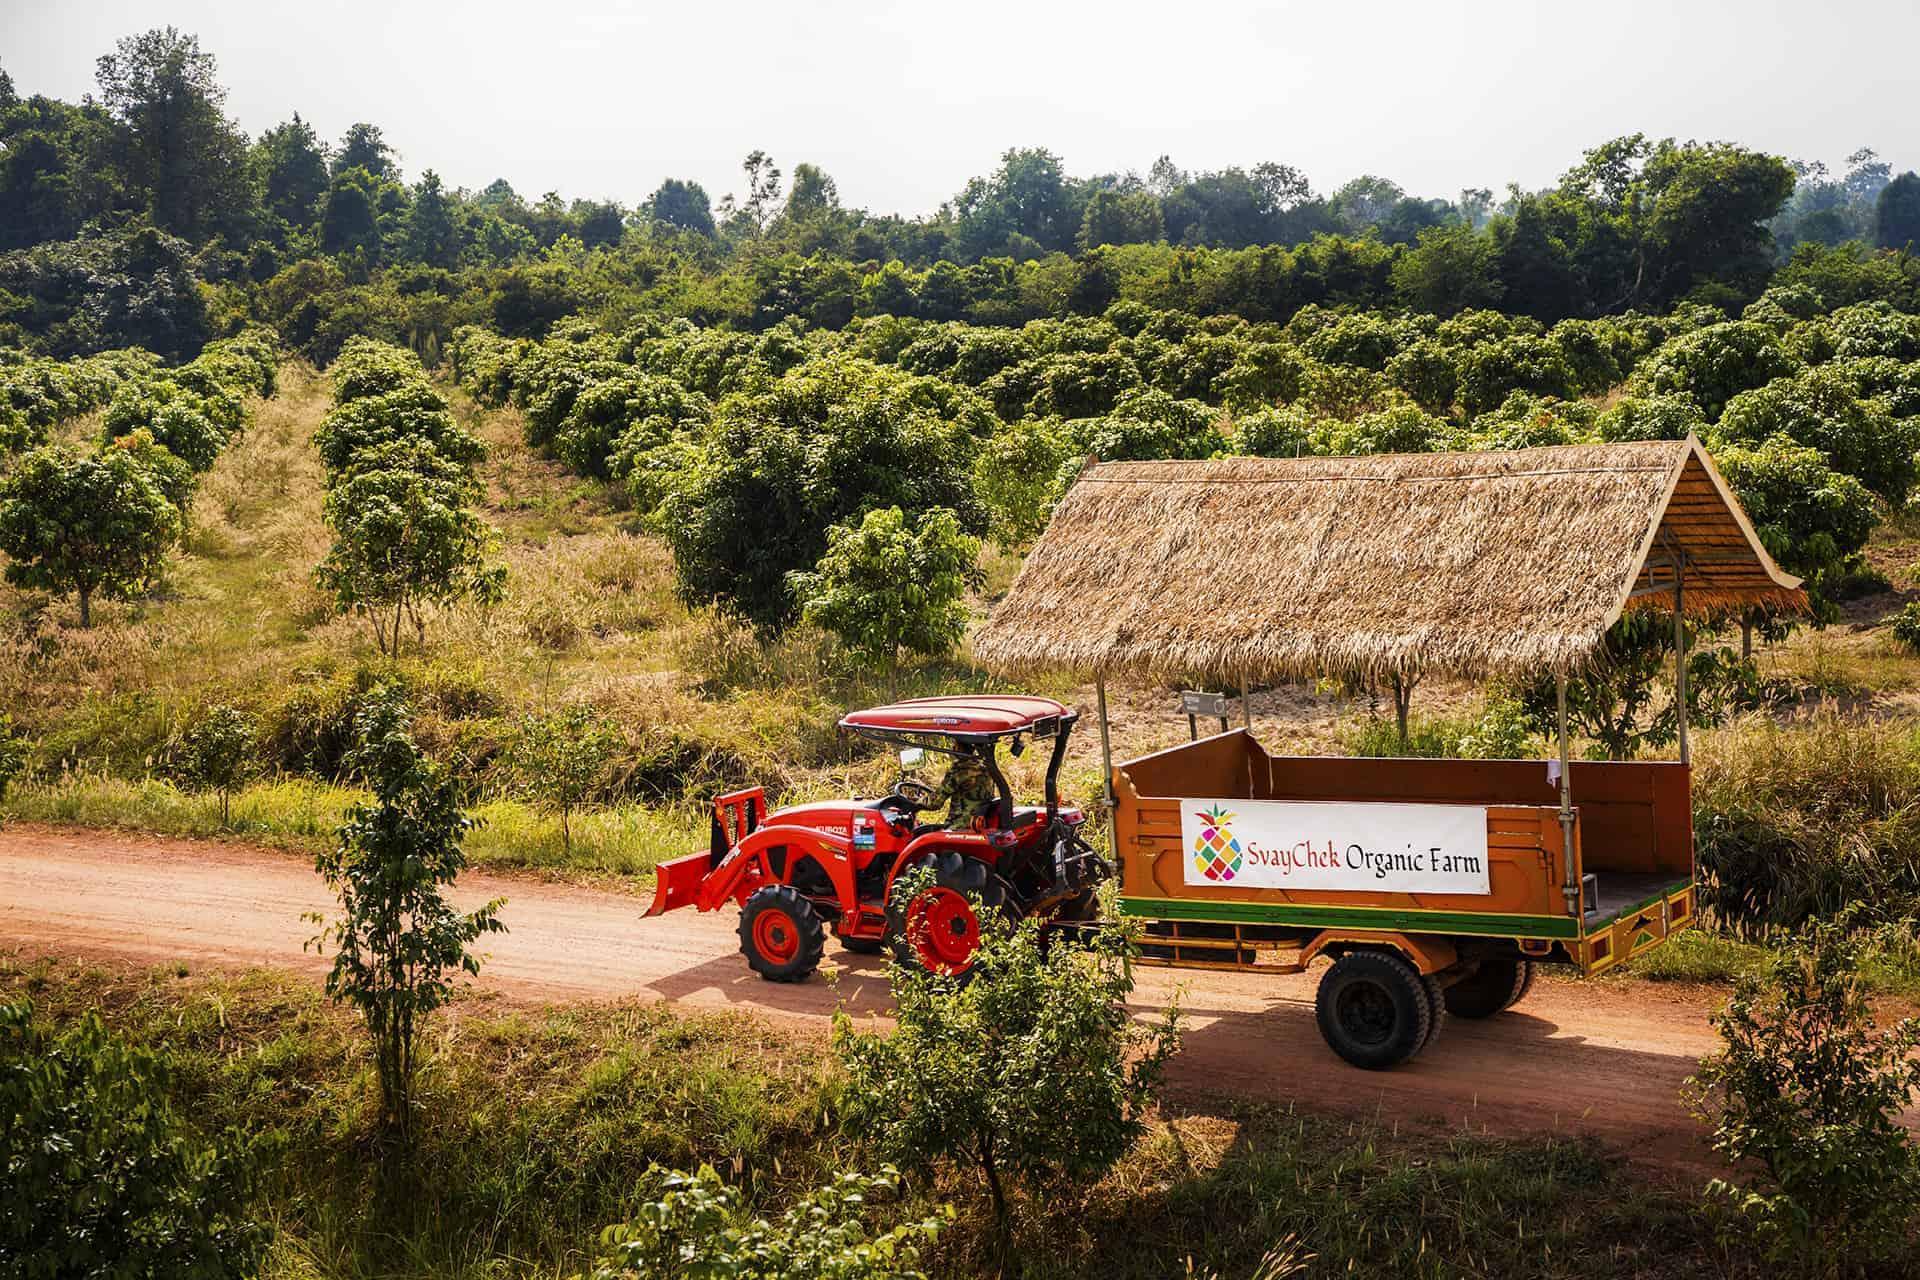 Svay Chek Farm Tractor